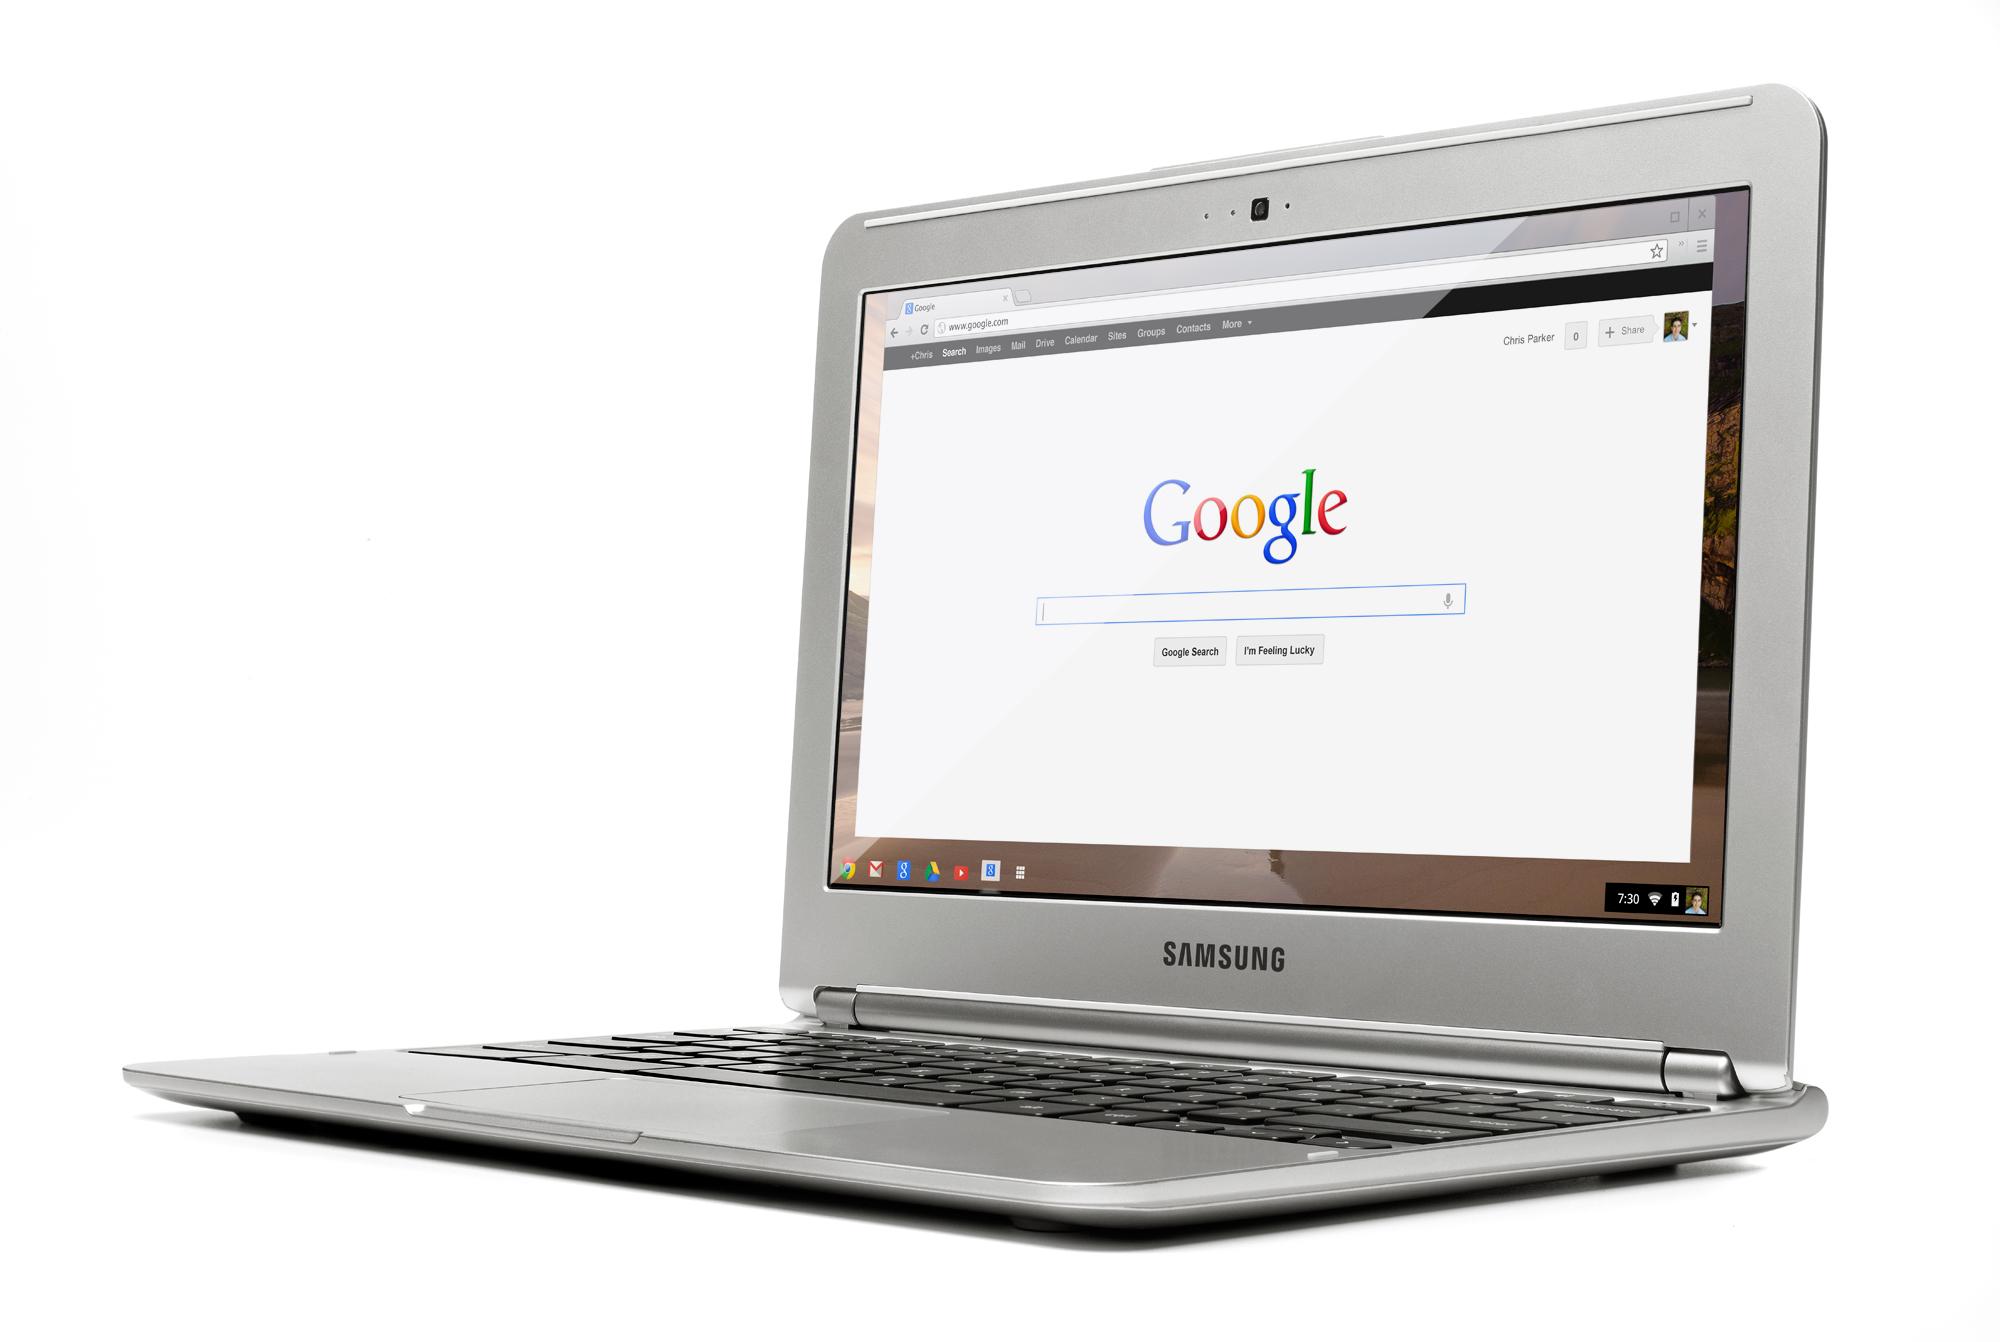 Win a SAMSUNG Google Chromebook LAPTOP!